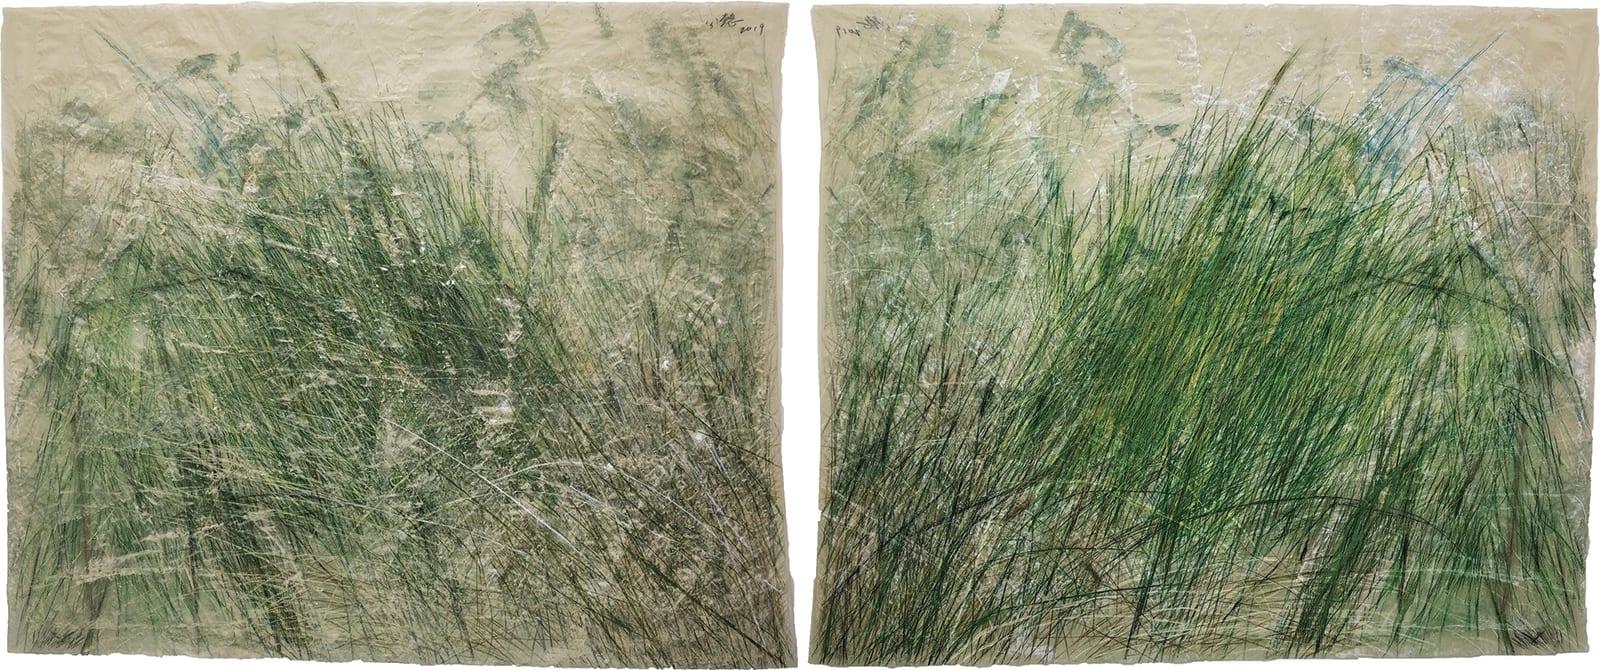 Wang Gongyi 王公懿, Leaves of Grass No.4 草葉集之四, 2019